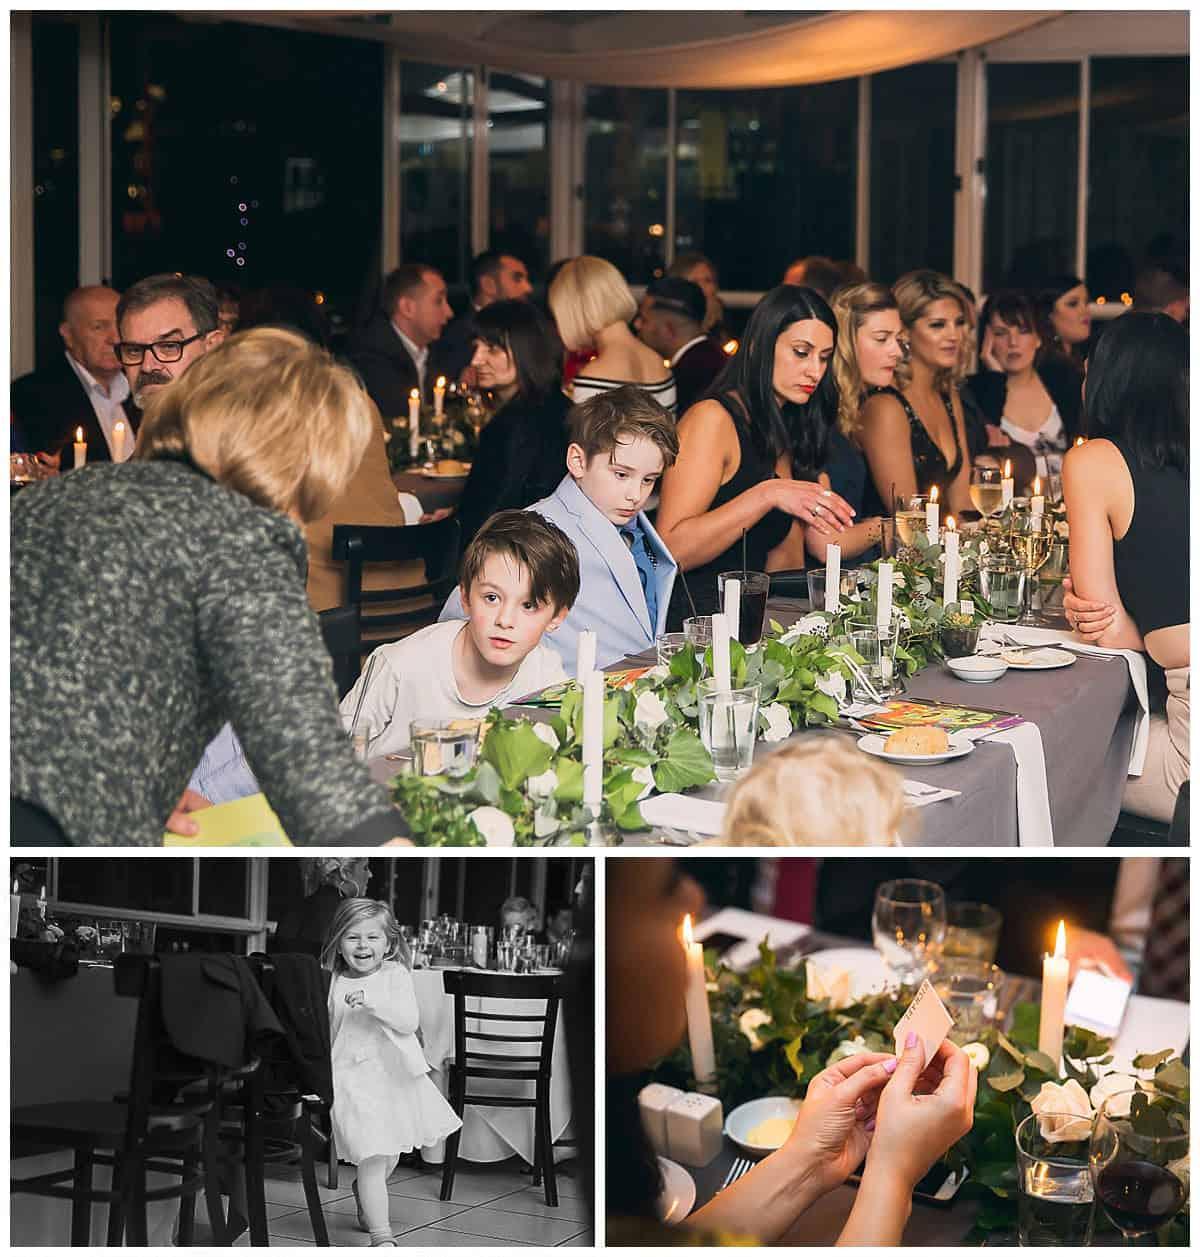 Natasa & Davor's Wedding Reception at the WIillows